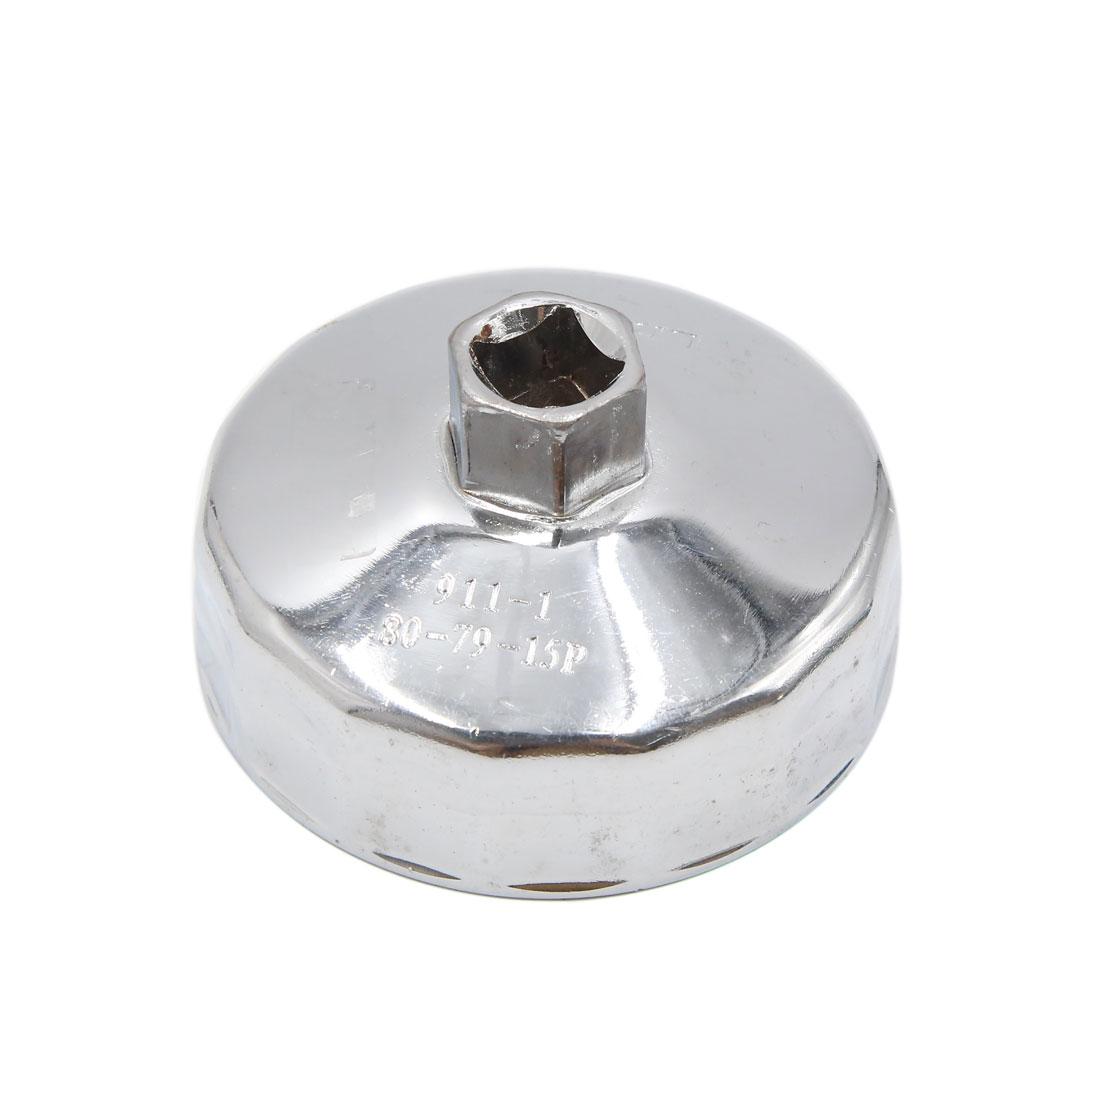 15 Flutes 78mm Inner Dia Stainless Steel Oil Filter Wrench Cap Remover for Car